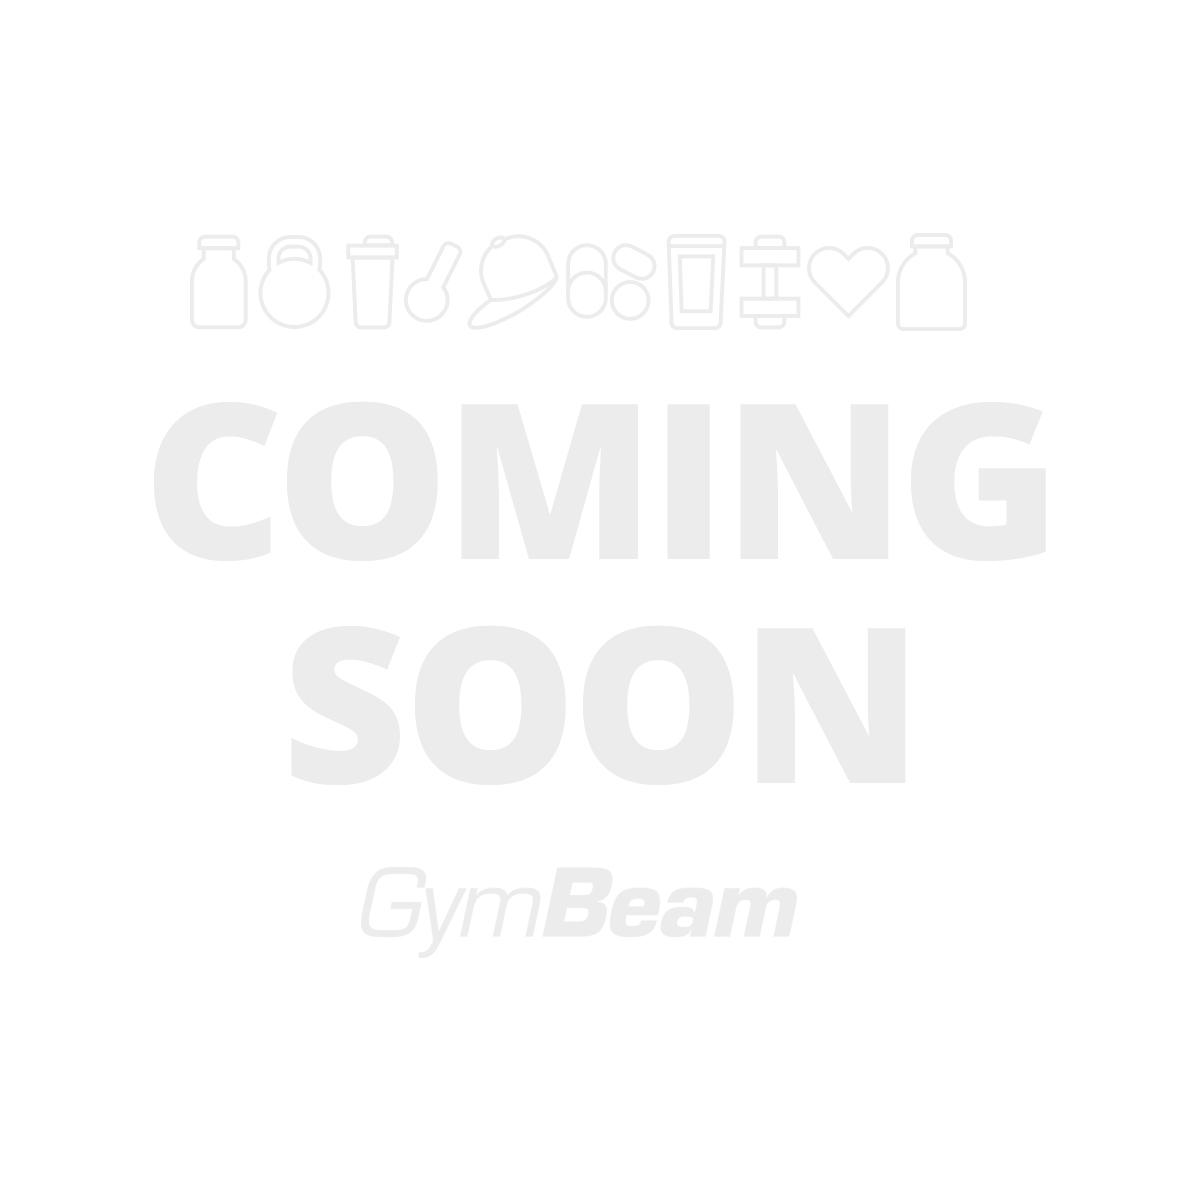 Creatina TABS 1500 mg - 200tbl - GymBeam